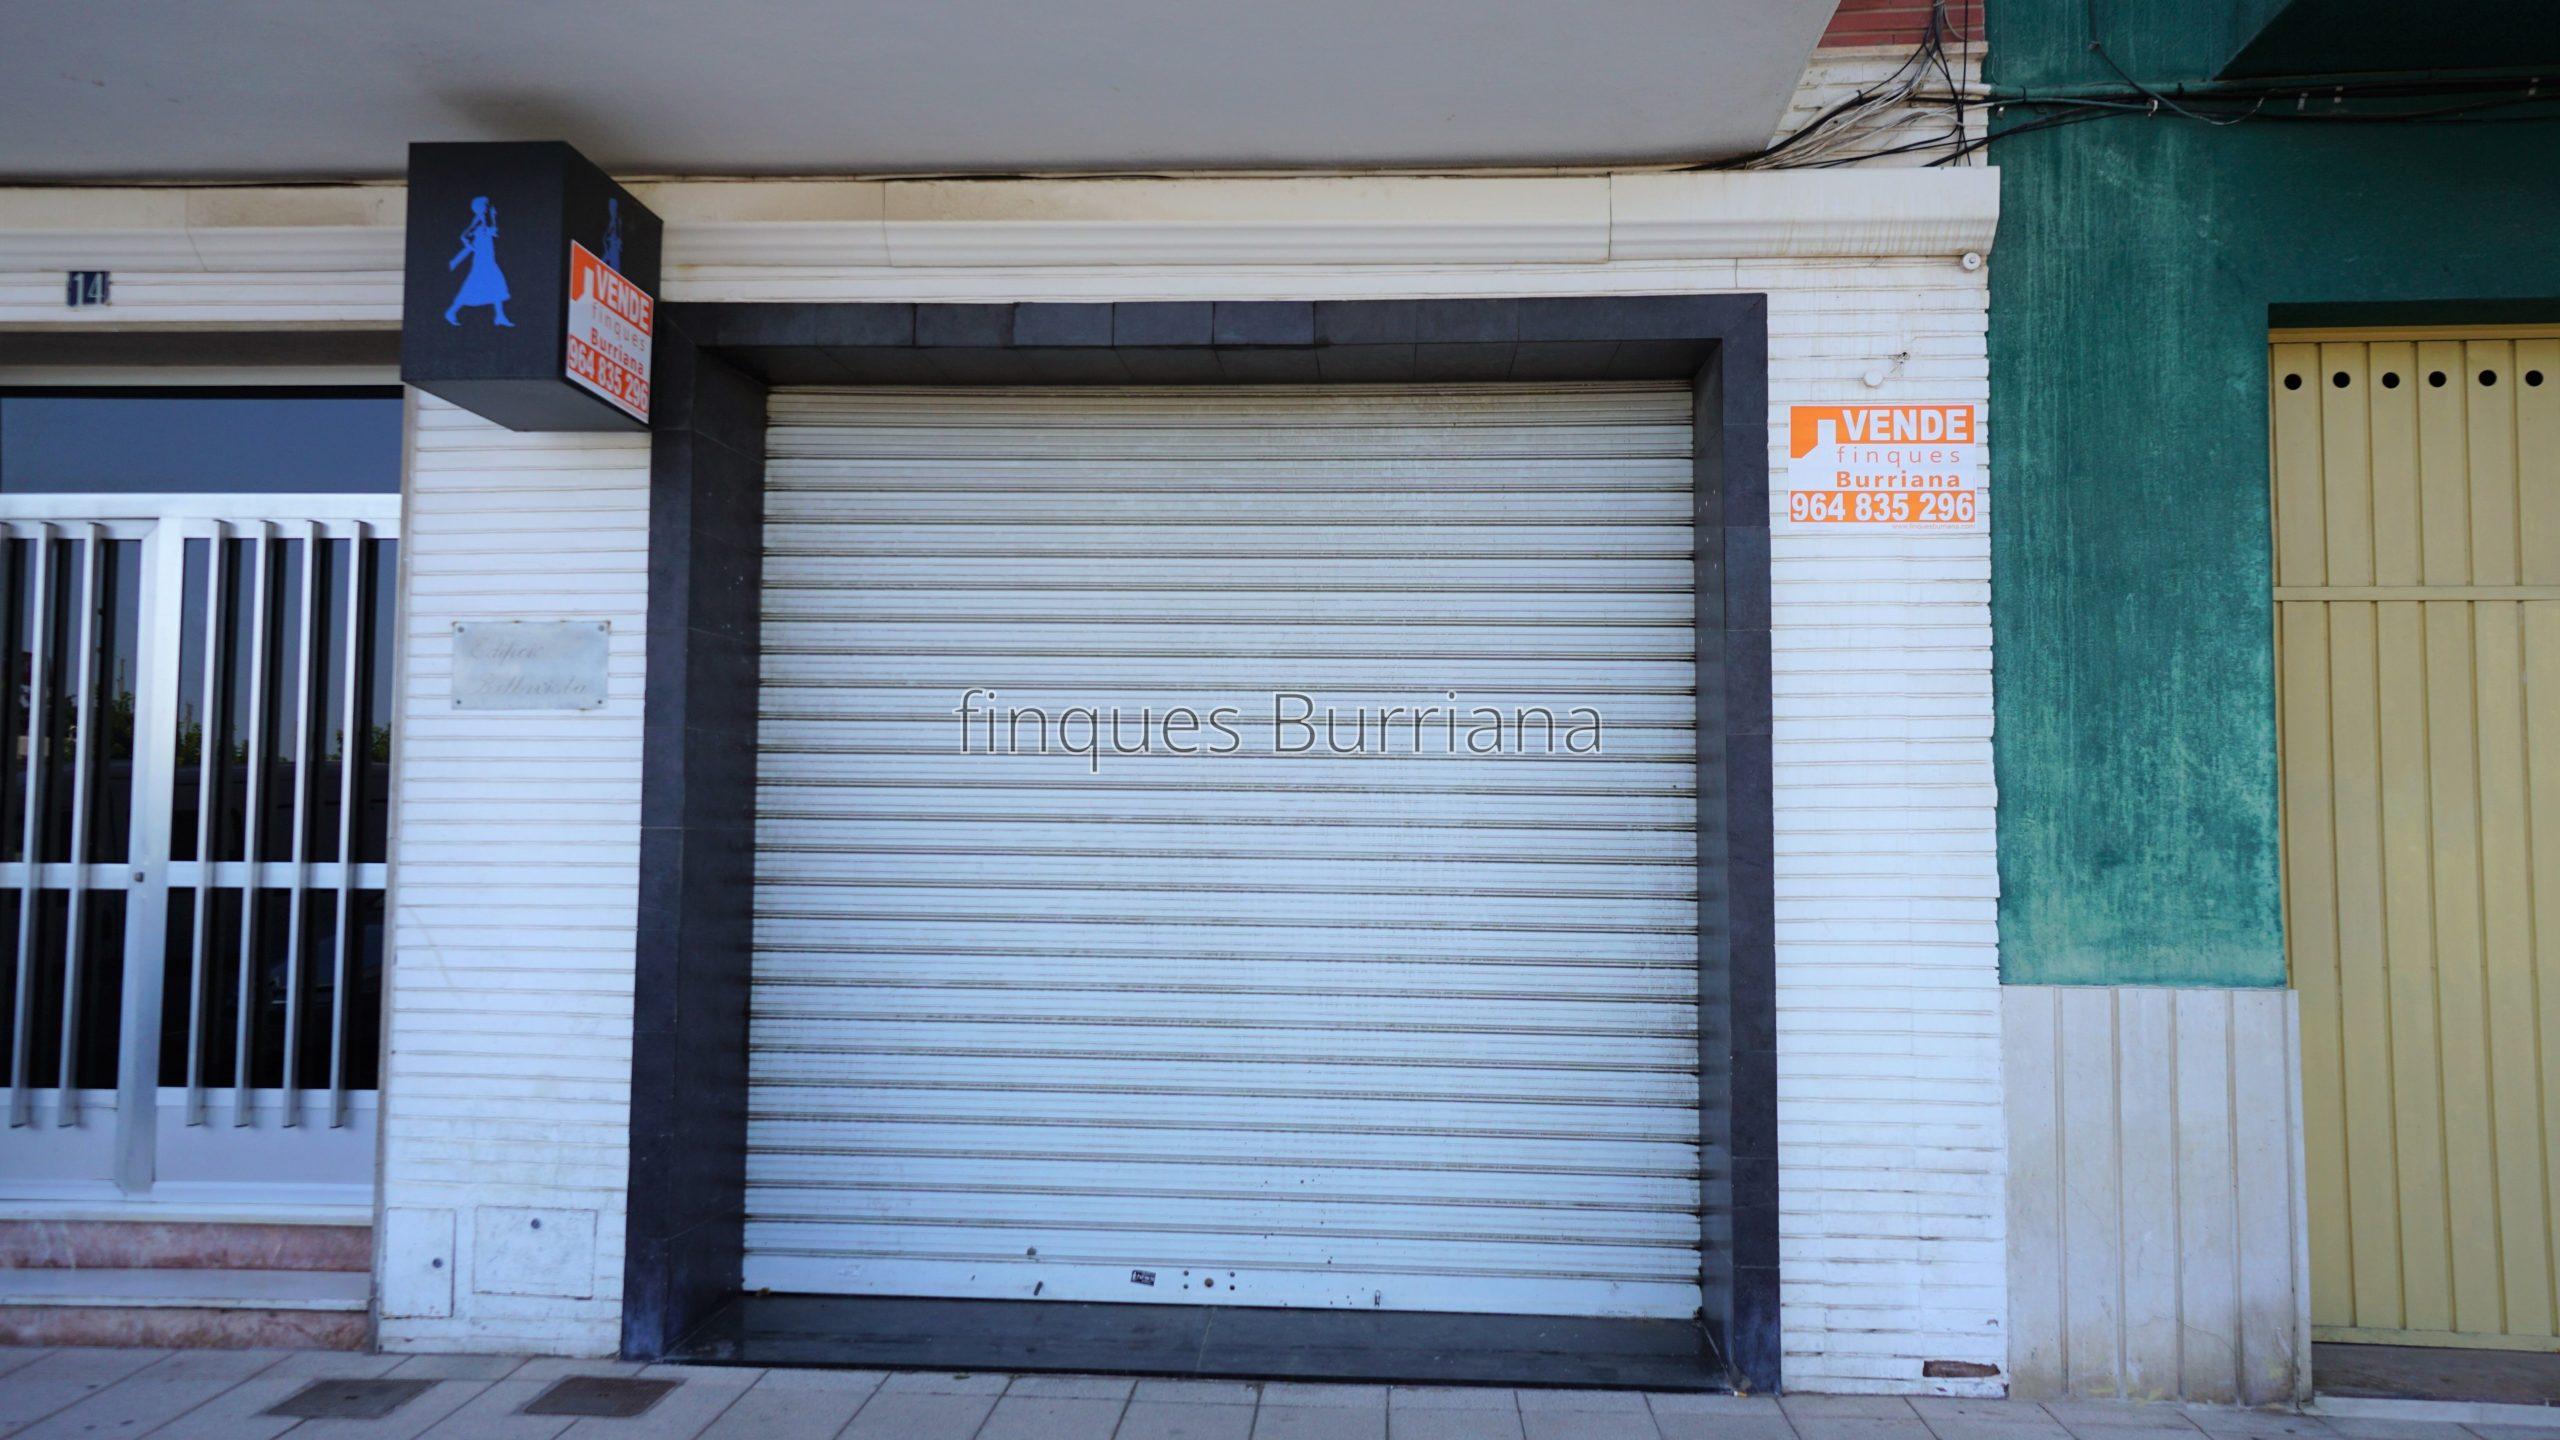 Local comercial en Venta en Burriana (Castellón) Zona Puerto